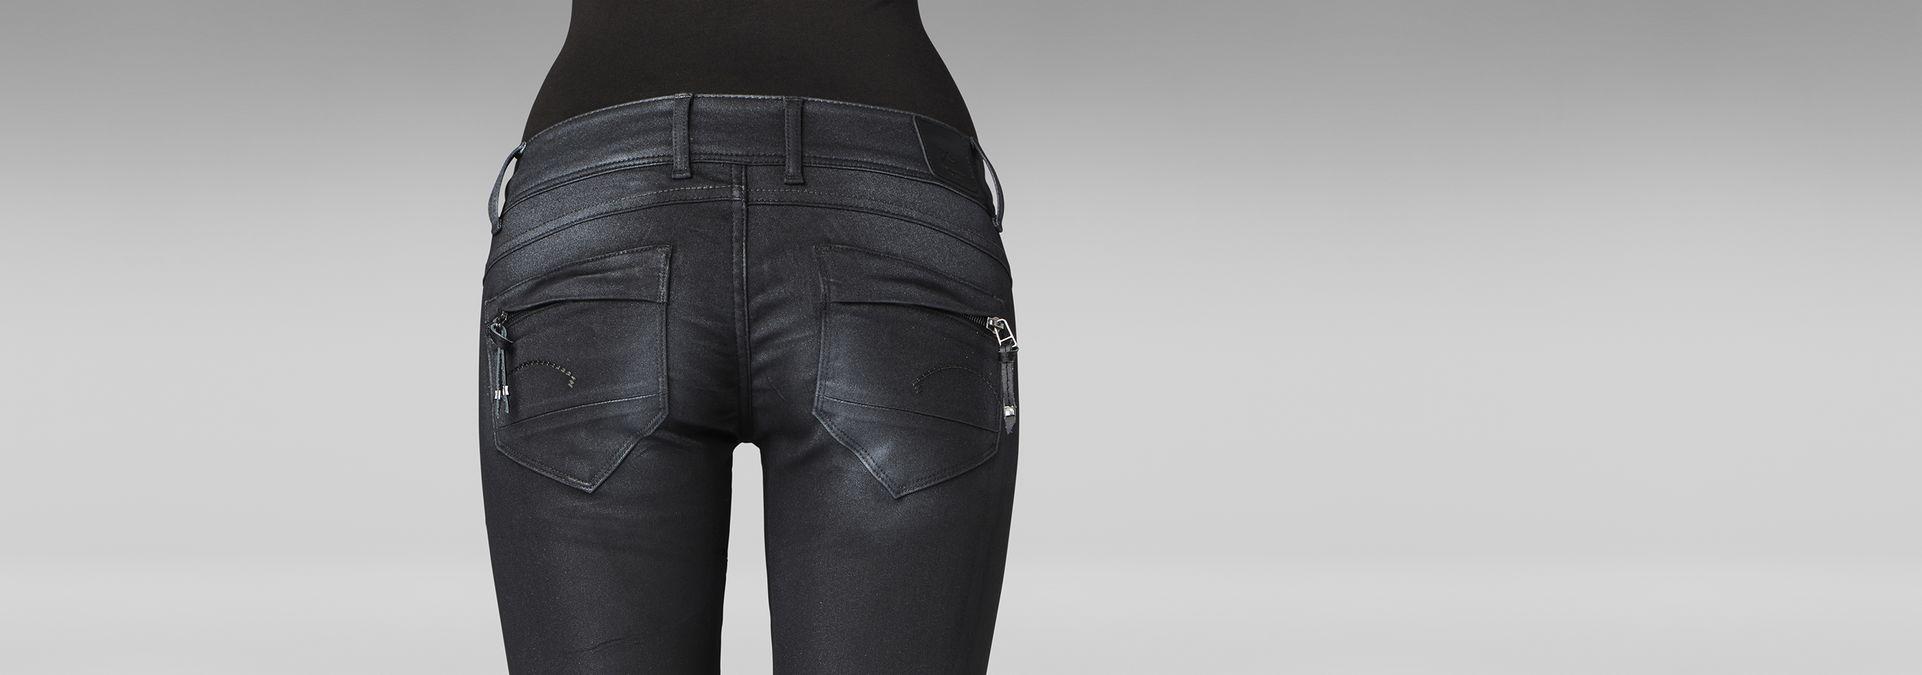 midge cody skinny jeans cobler smash g star raw. Black Bedroom Furniture Sets. Home Design Ideas